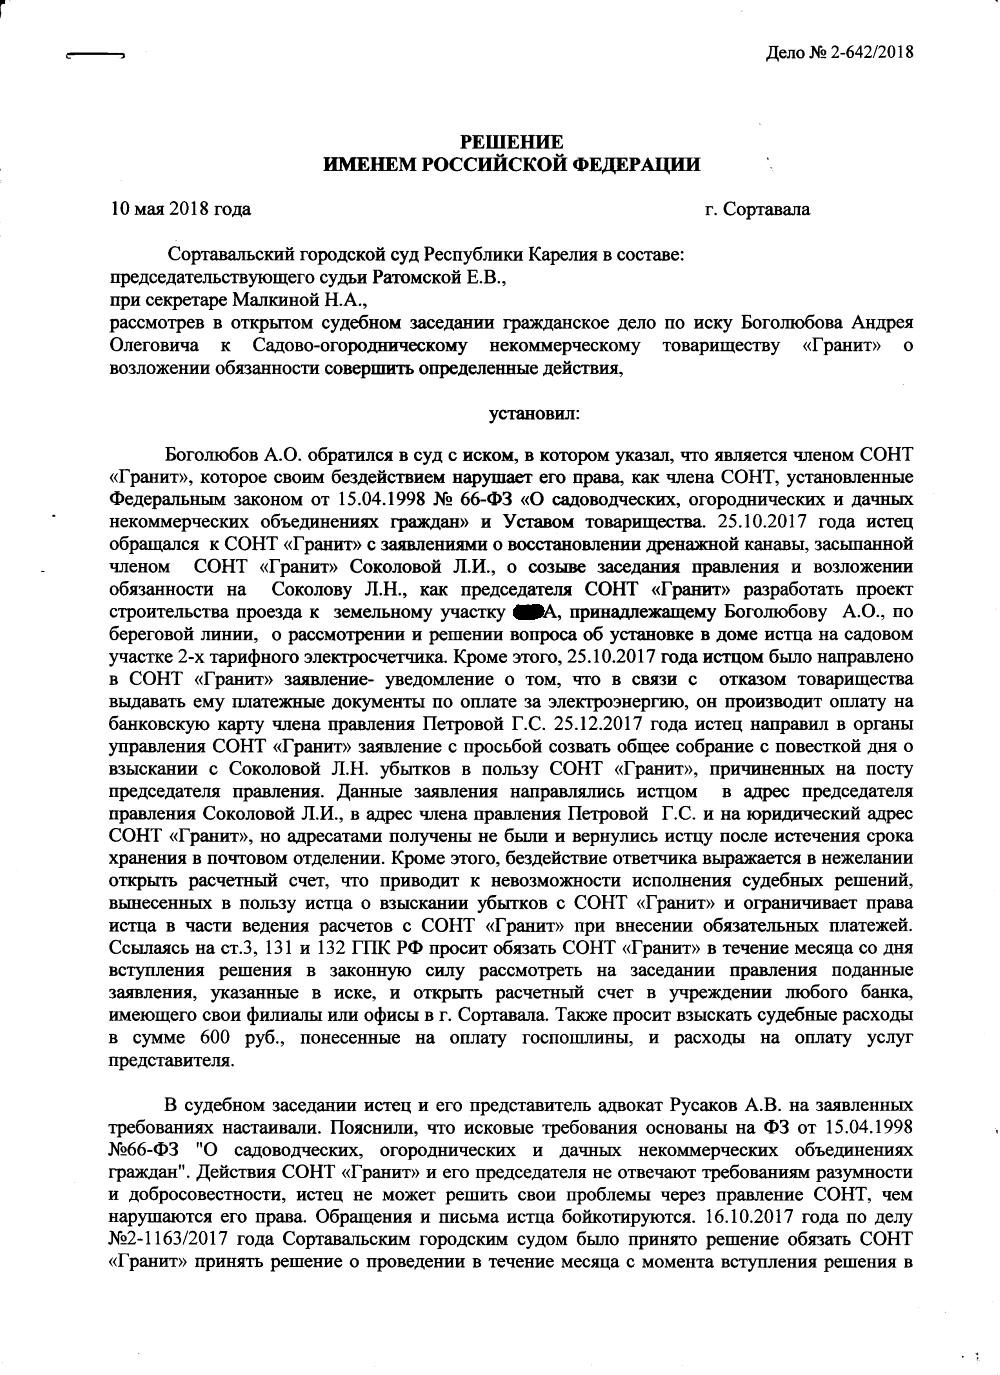 https://sontgranit.ru/forum/img/sokol/20180510-решение-01.png